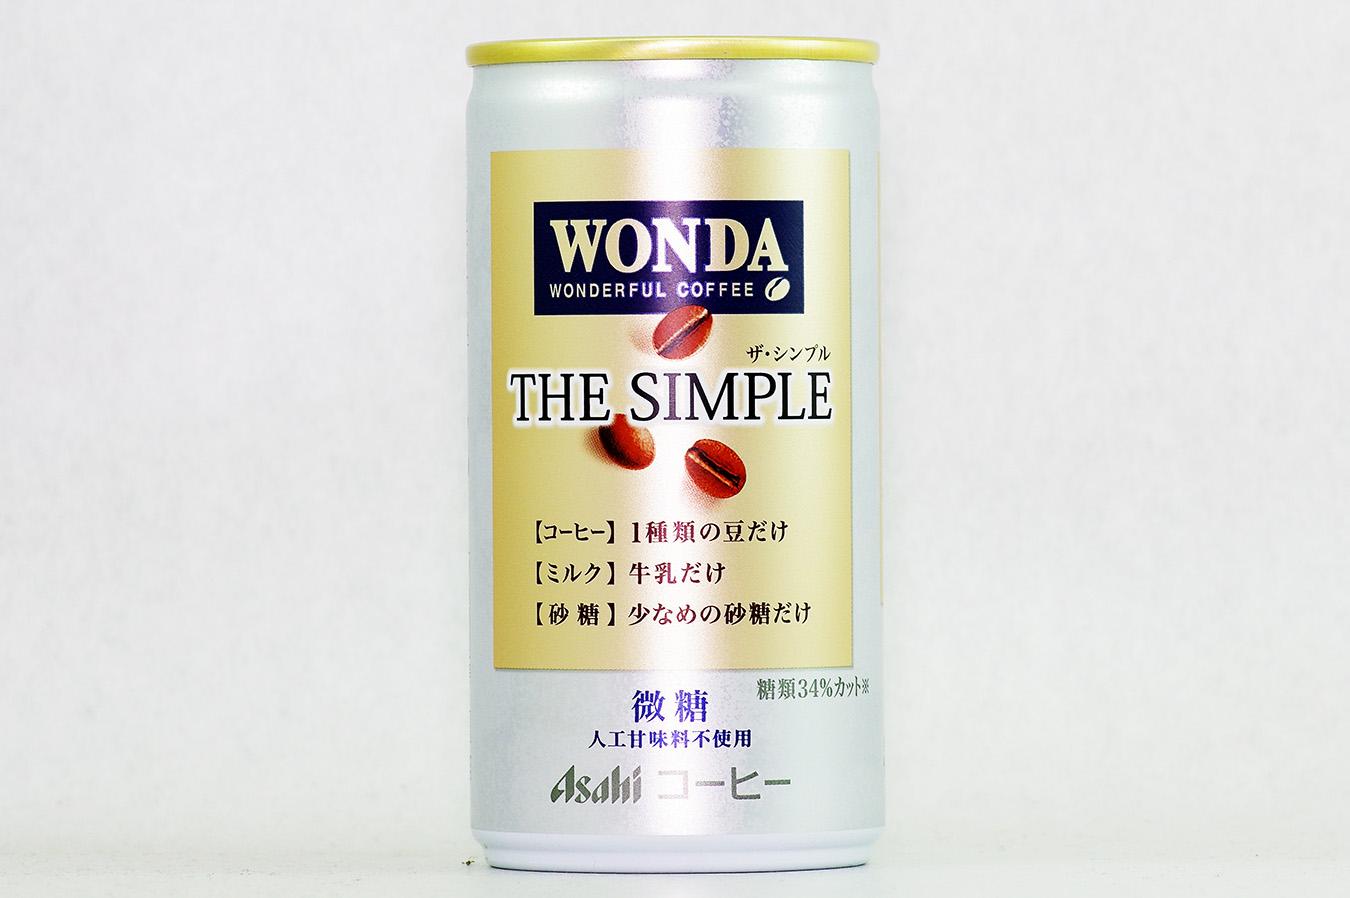 WONDA ザ・シンプル